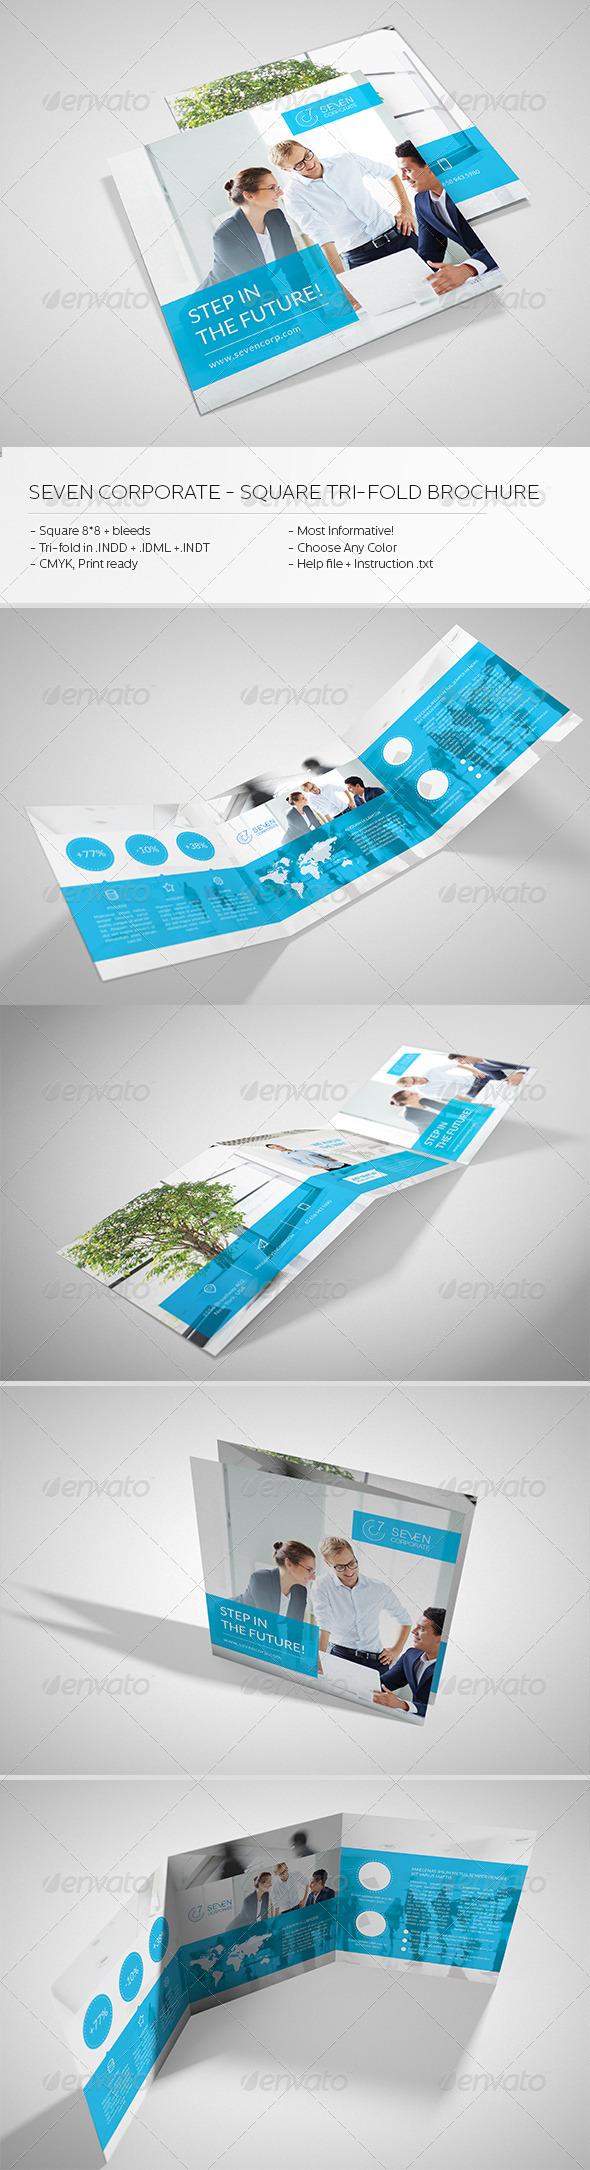 Square Corporate Tri-fold Brochure - Brochures Print Templates